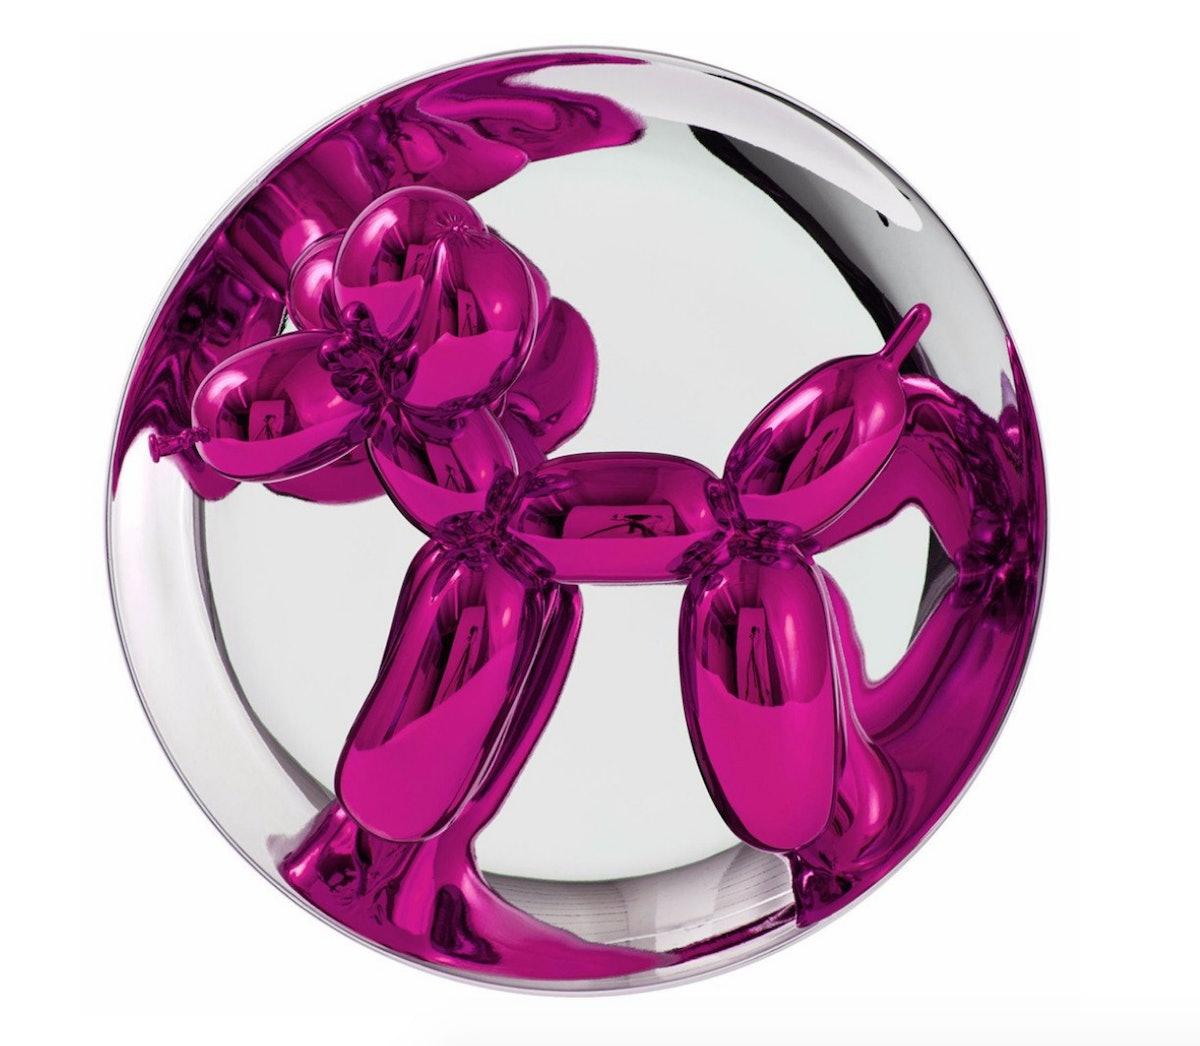 koons-balloon-dog-pink.png